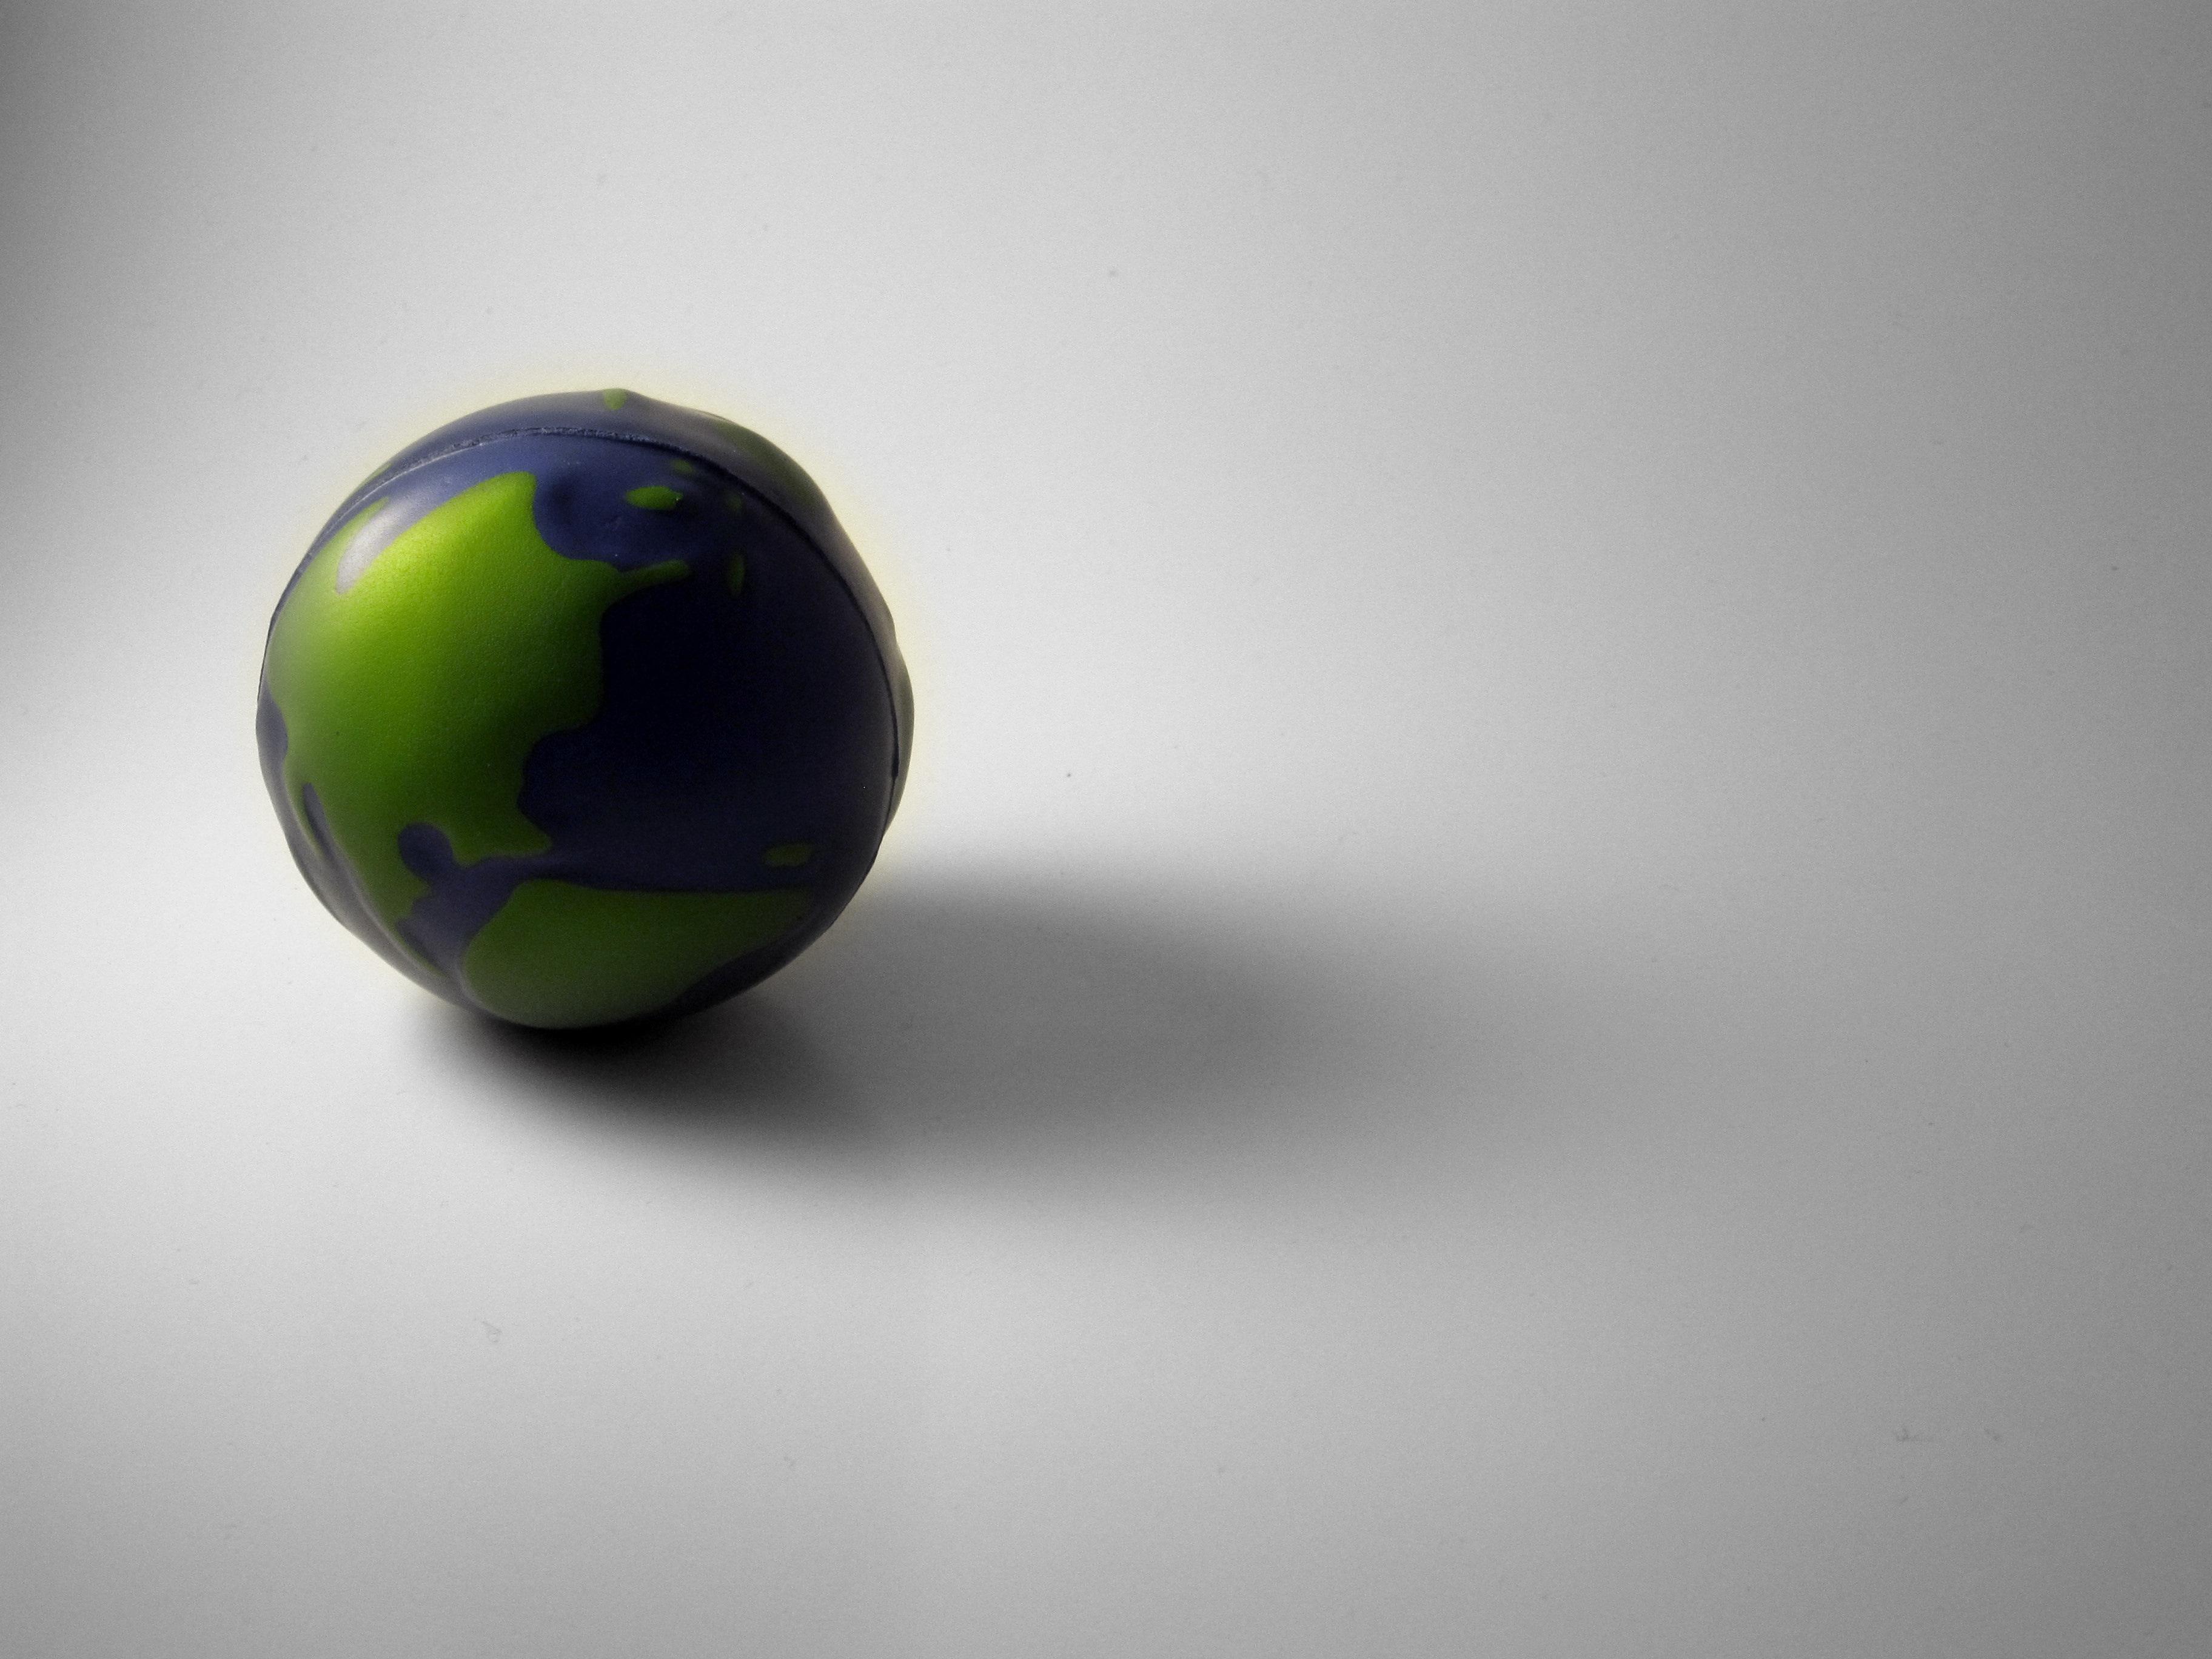 The World, Ball, Earth, Globe, Object, HQ Photo